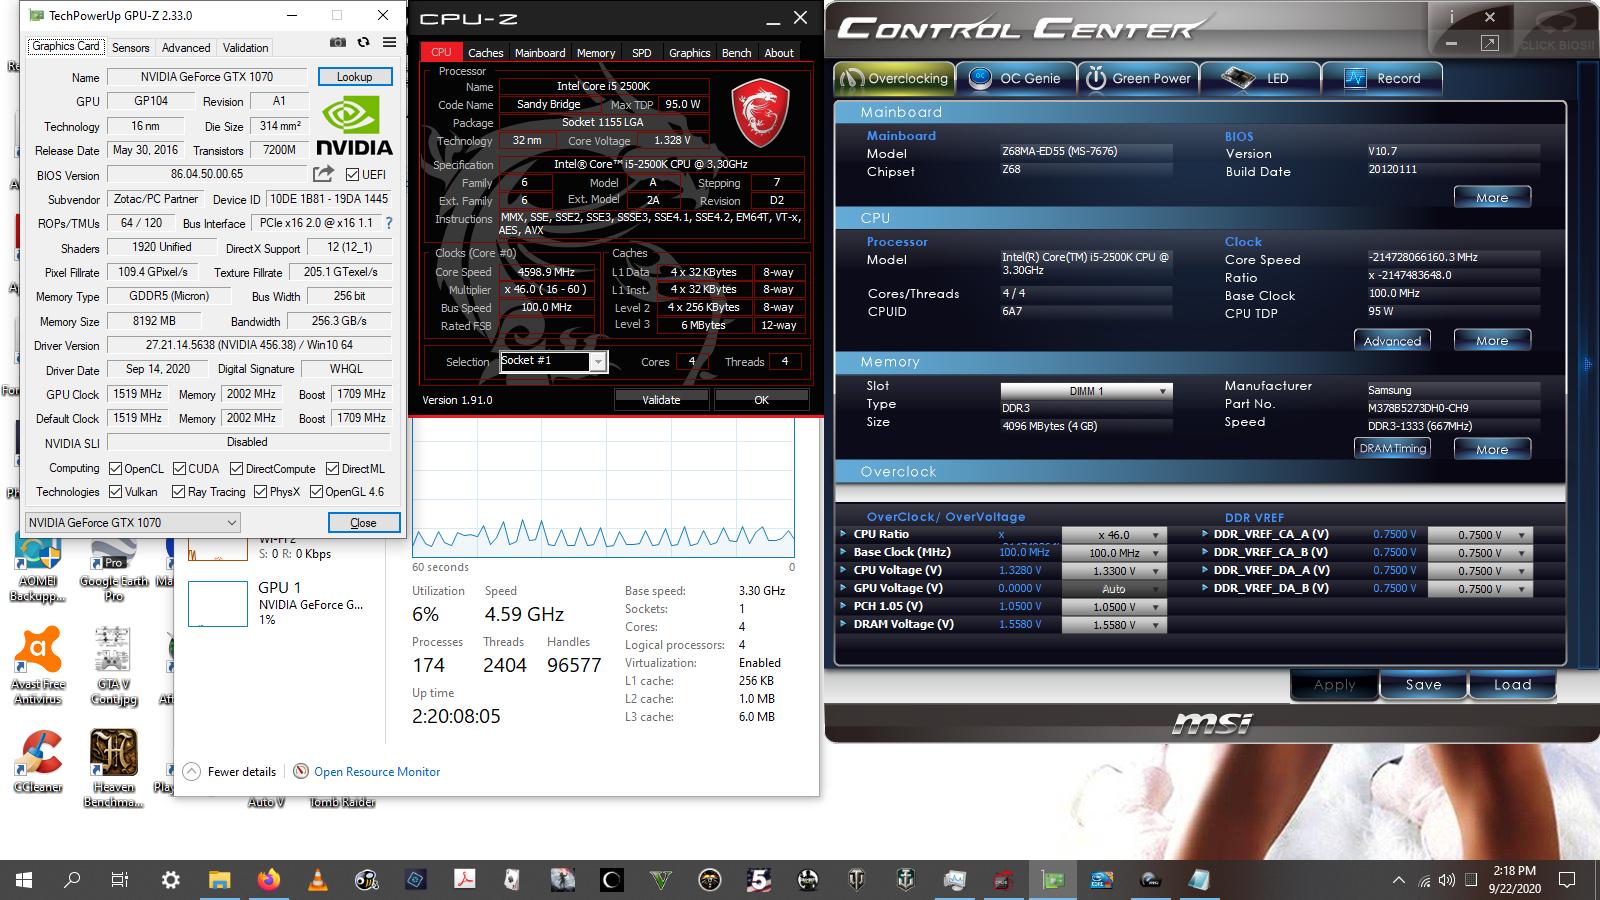 Desktop Screenshot 2020.09.22 - 14.18.51.63.png